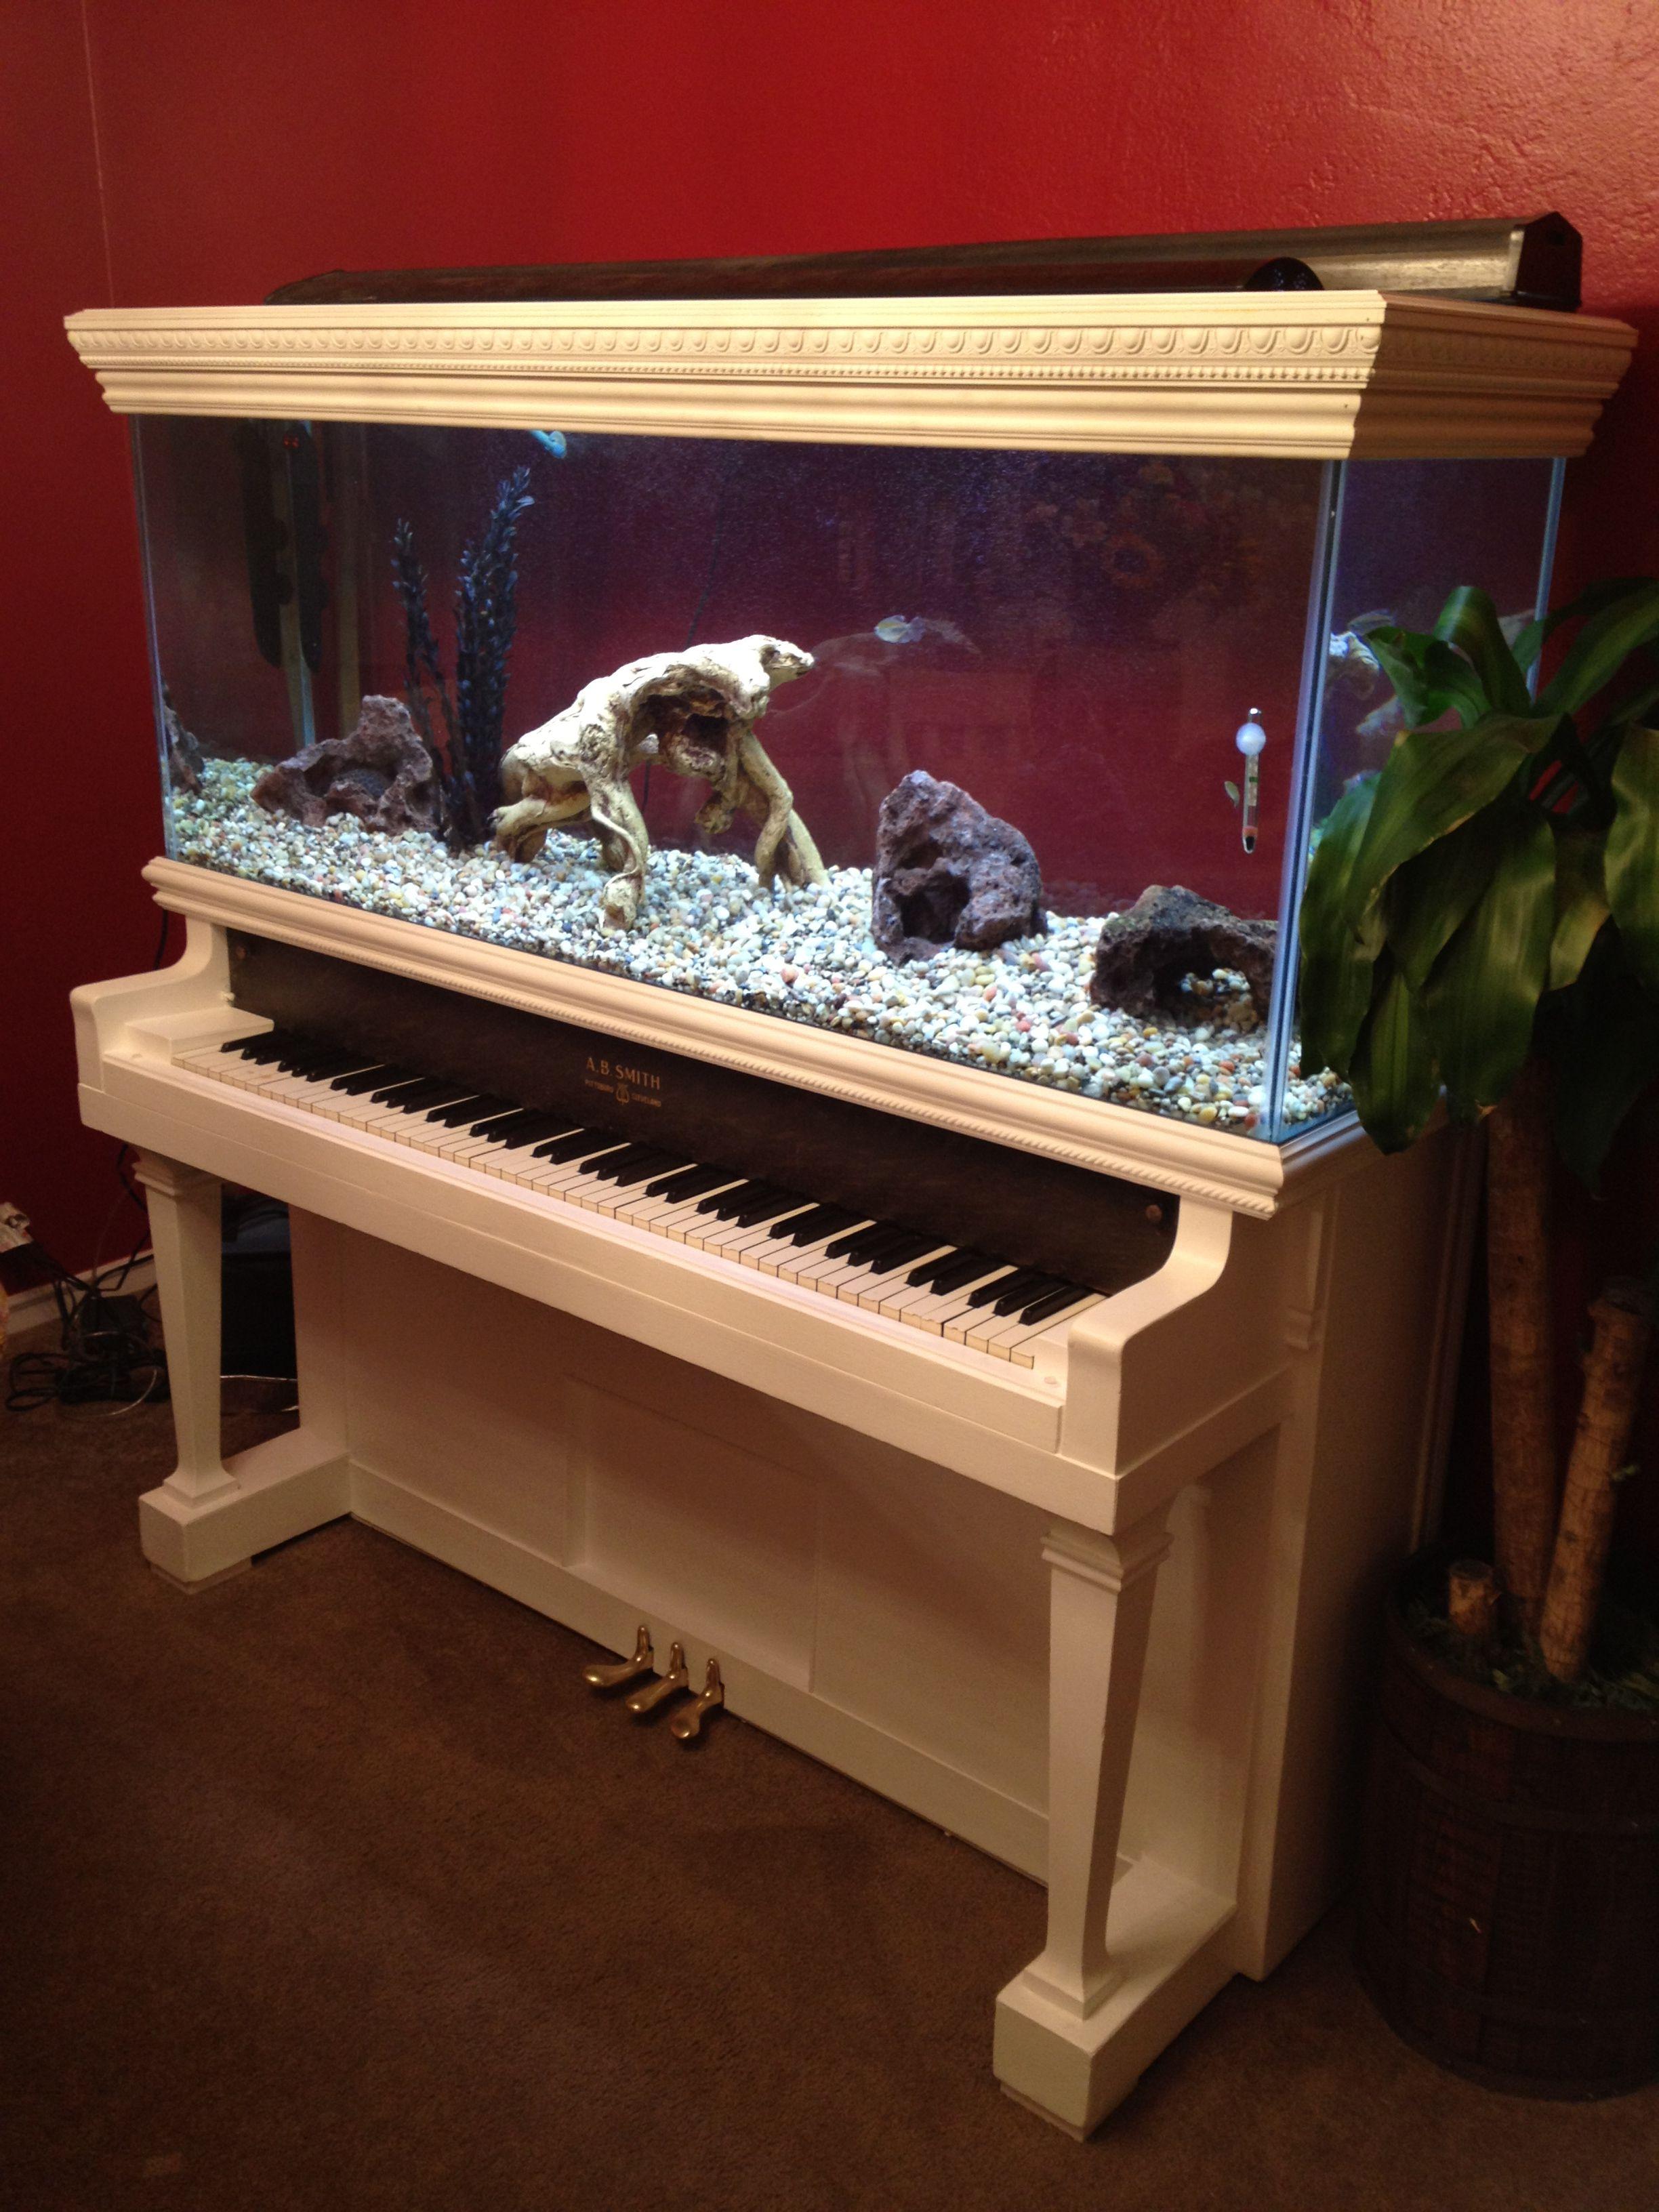 Fish Tanks on Pinterest | Fish Tanks, Salt Water Fish and Aquarium